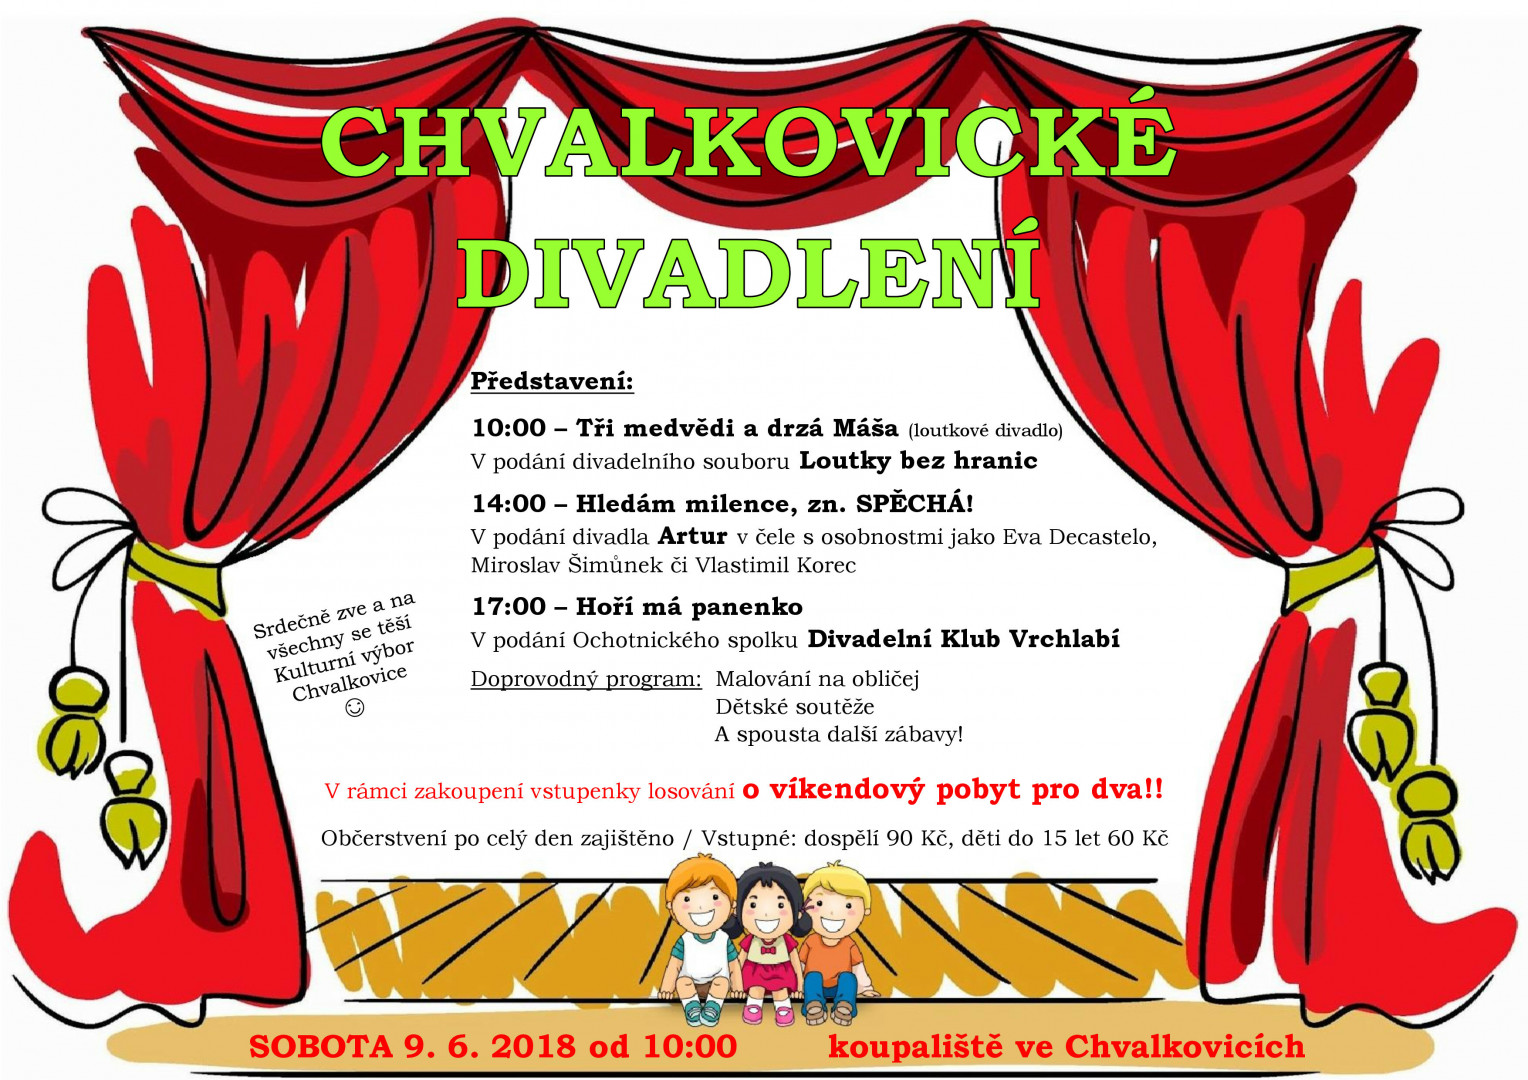 Krlovehradeck - Flirt - inzerty | Inzerce na alahlia.info